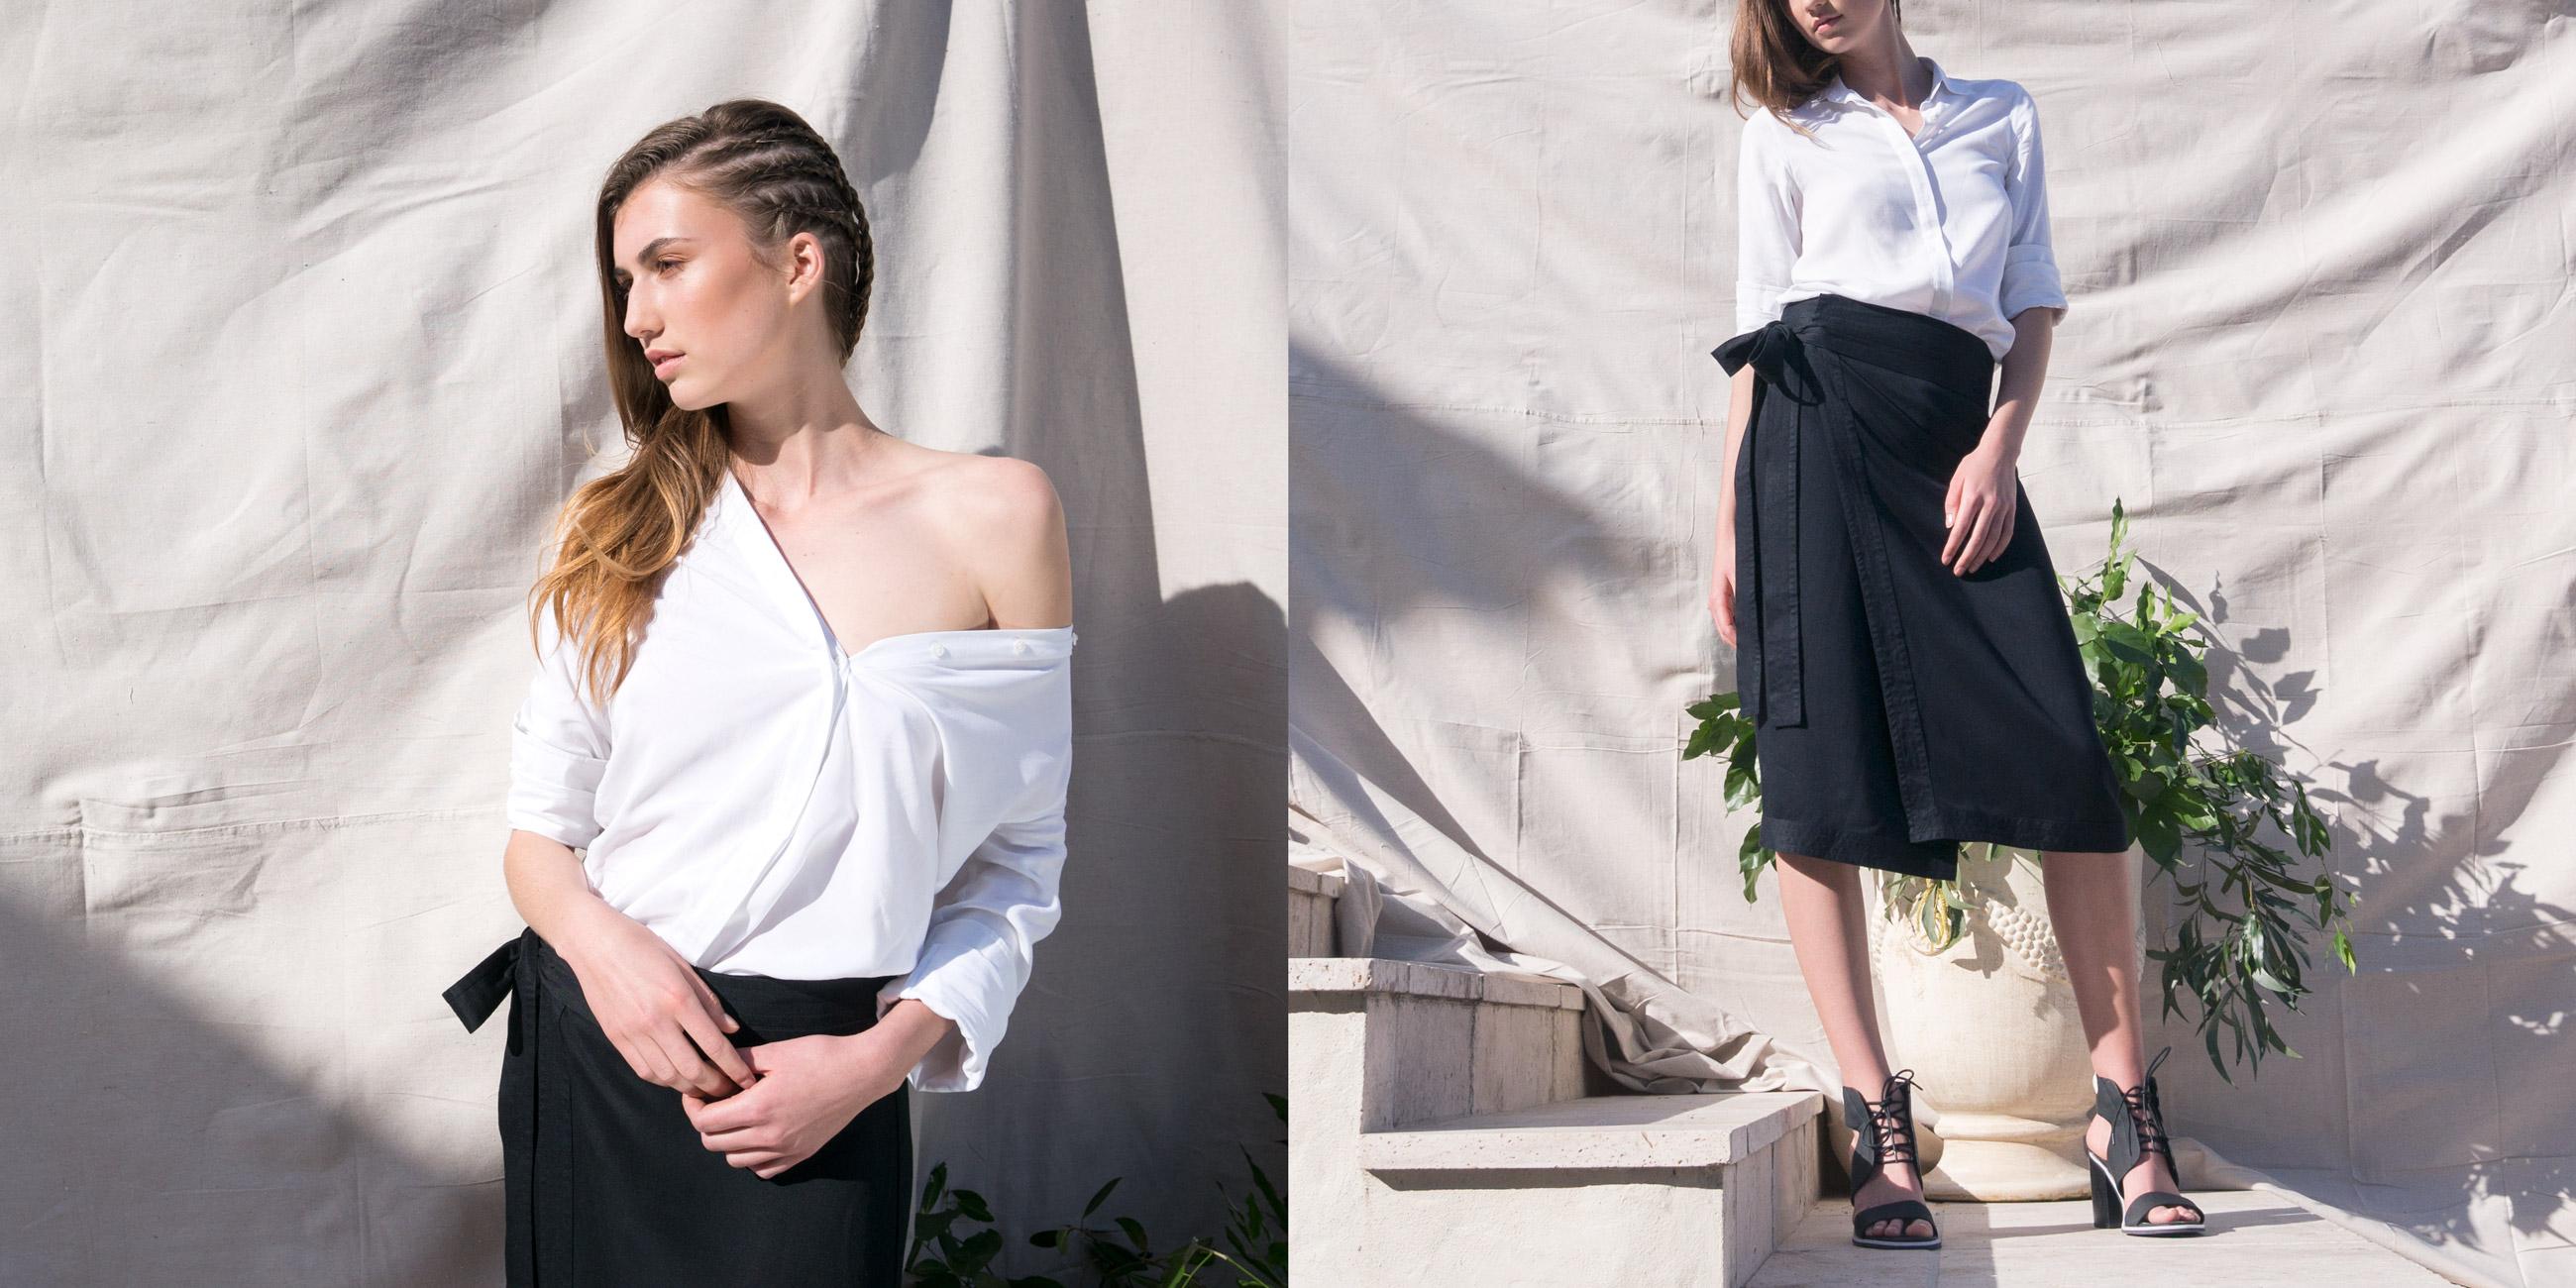 Bamboo Material Eco Friendly Fashion White Shirt Black Skirt